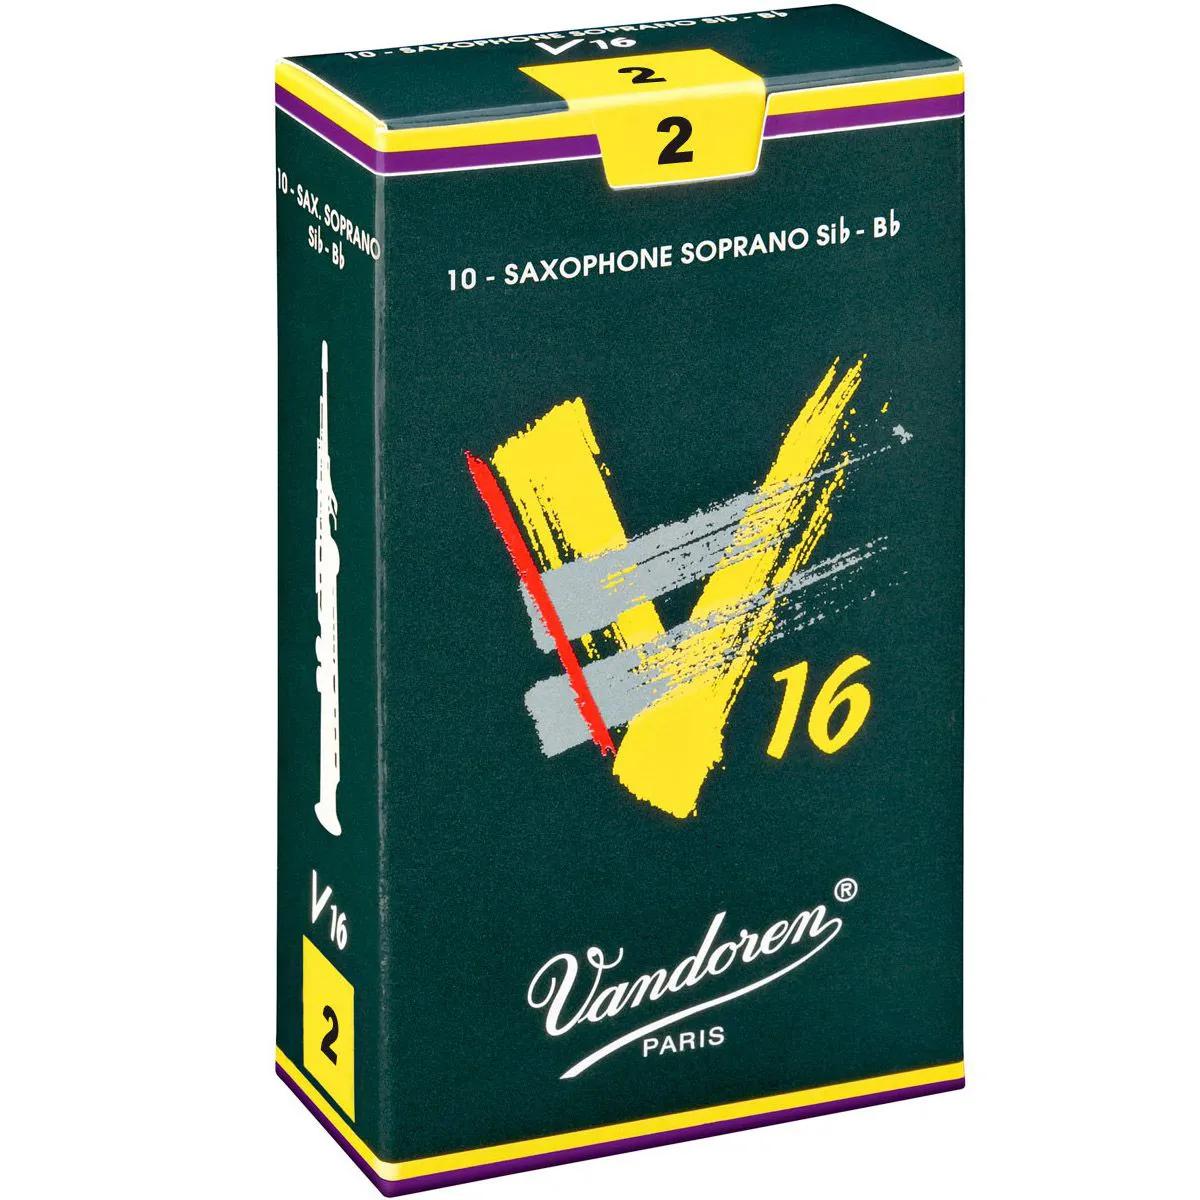 Palheta Vandoren V16 Nº 2 para Sax Soprano